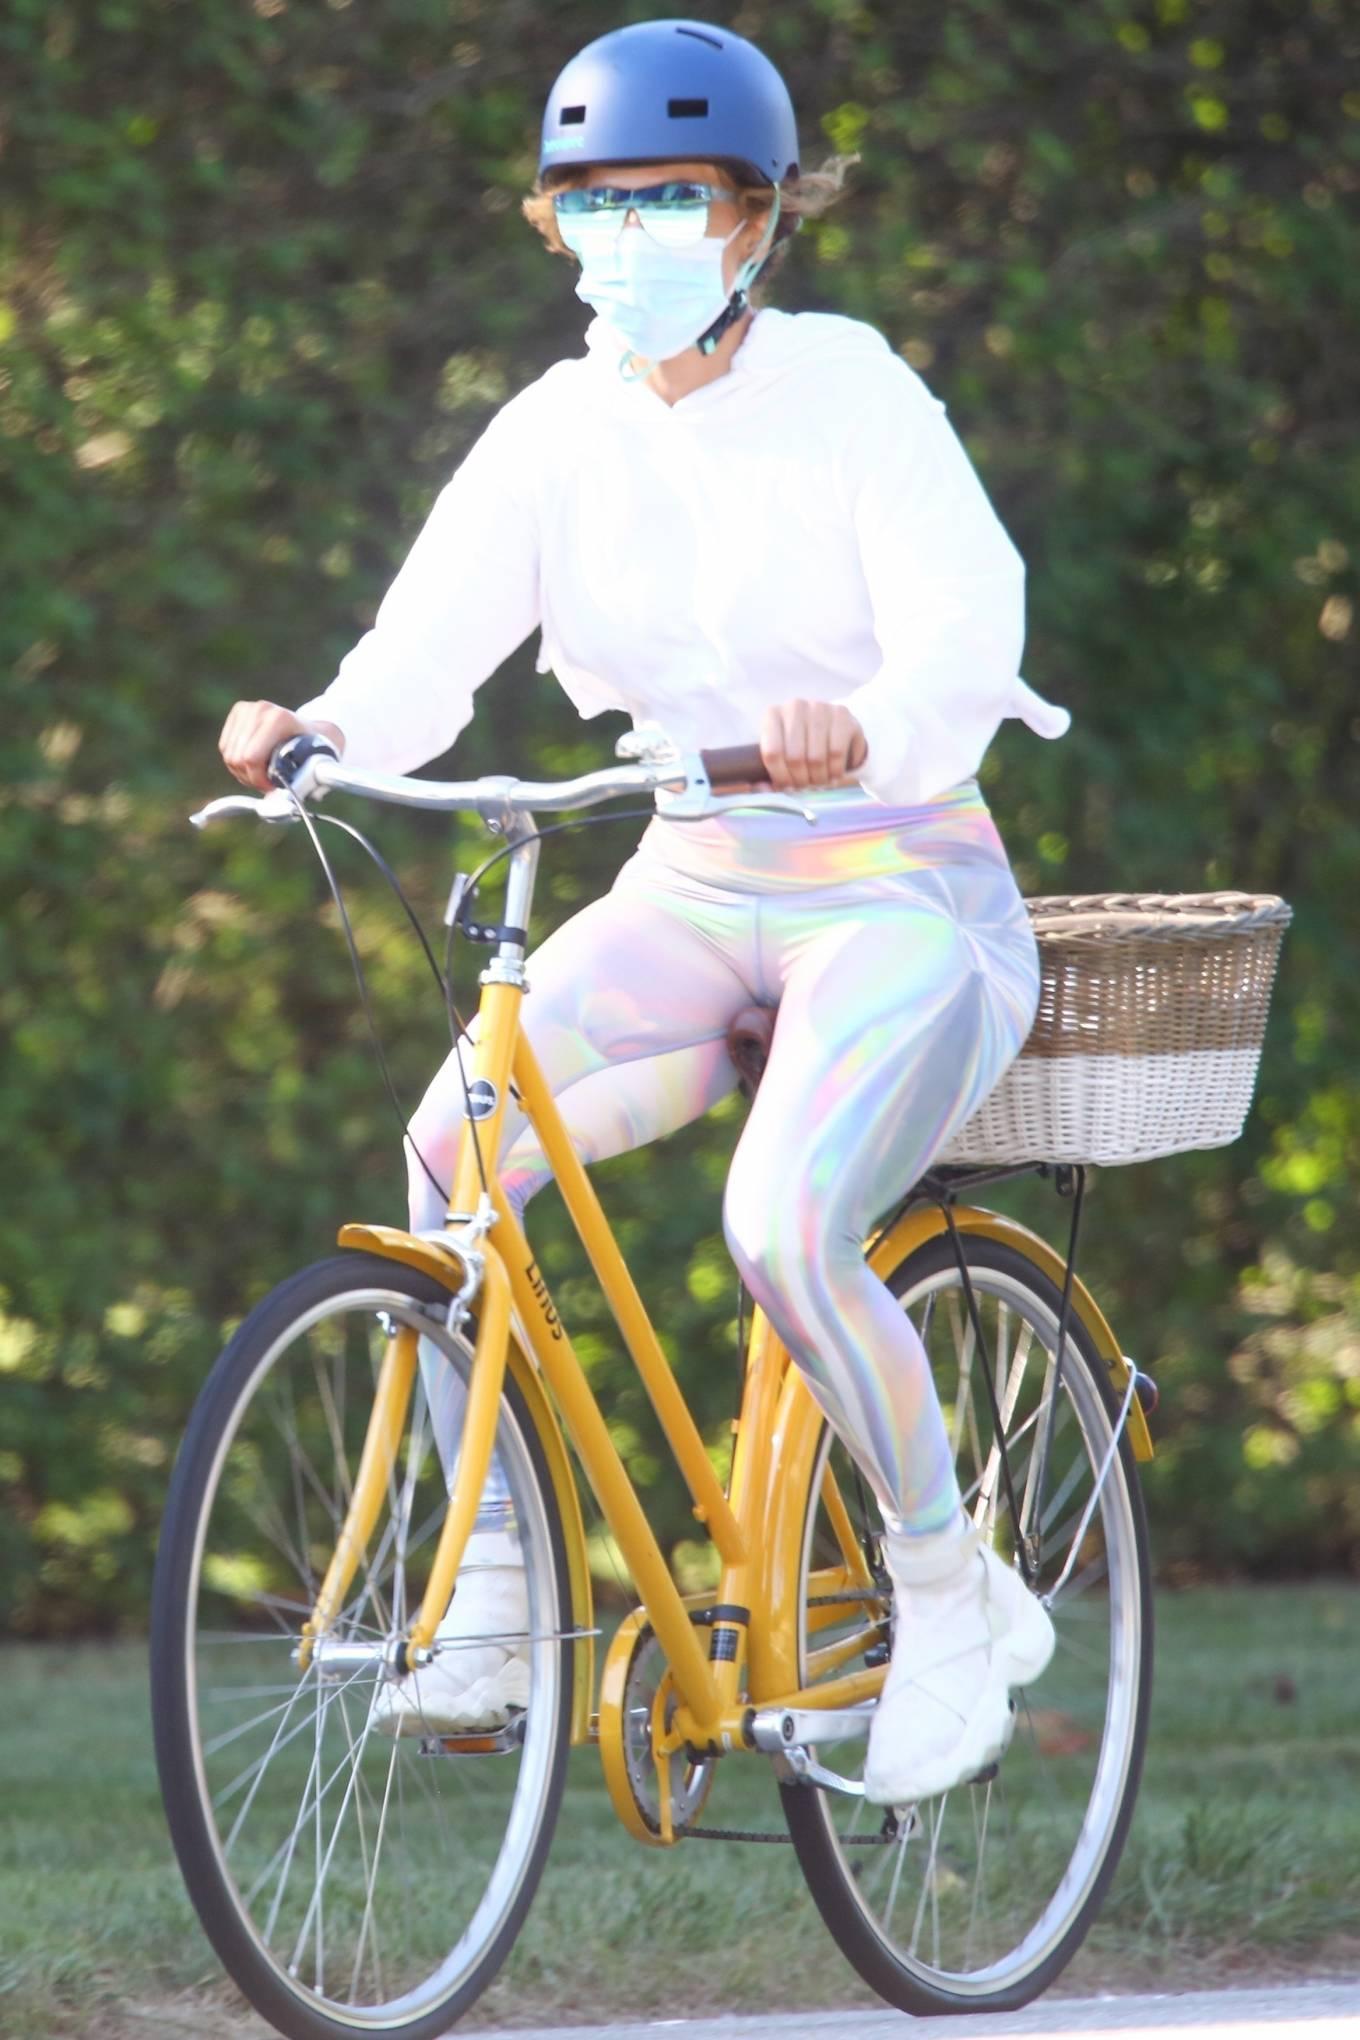 Alex Rodriguez and Jennifer Lopez - Bike ride in Hamptons - New York